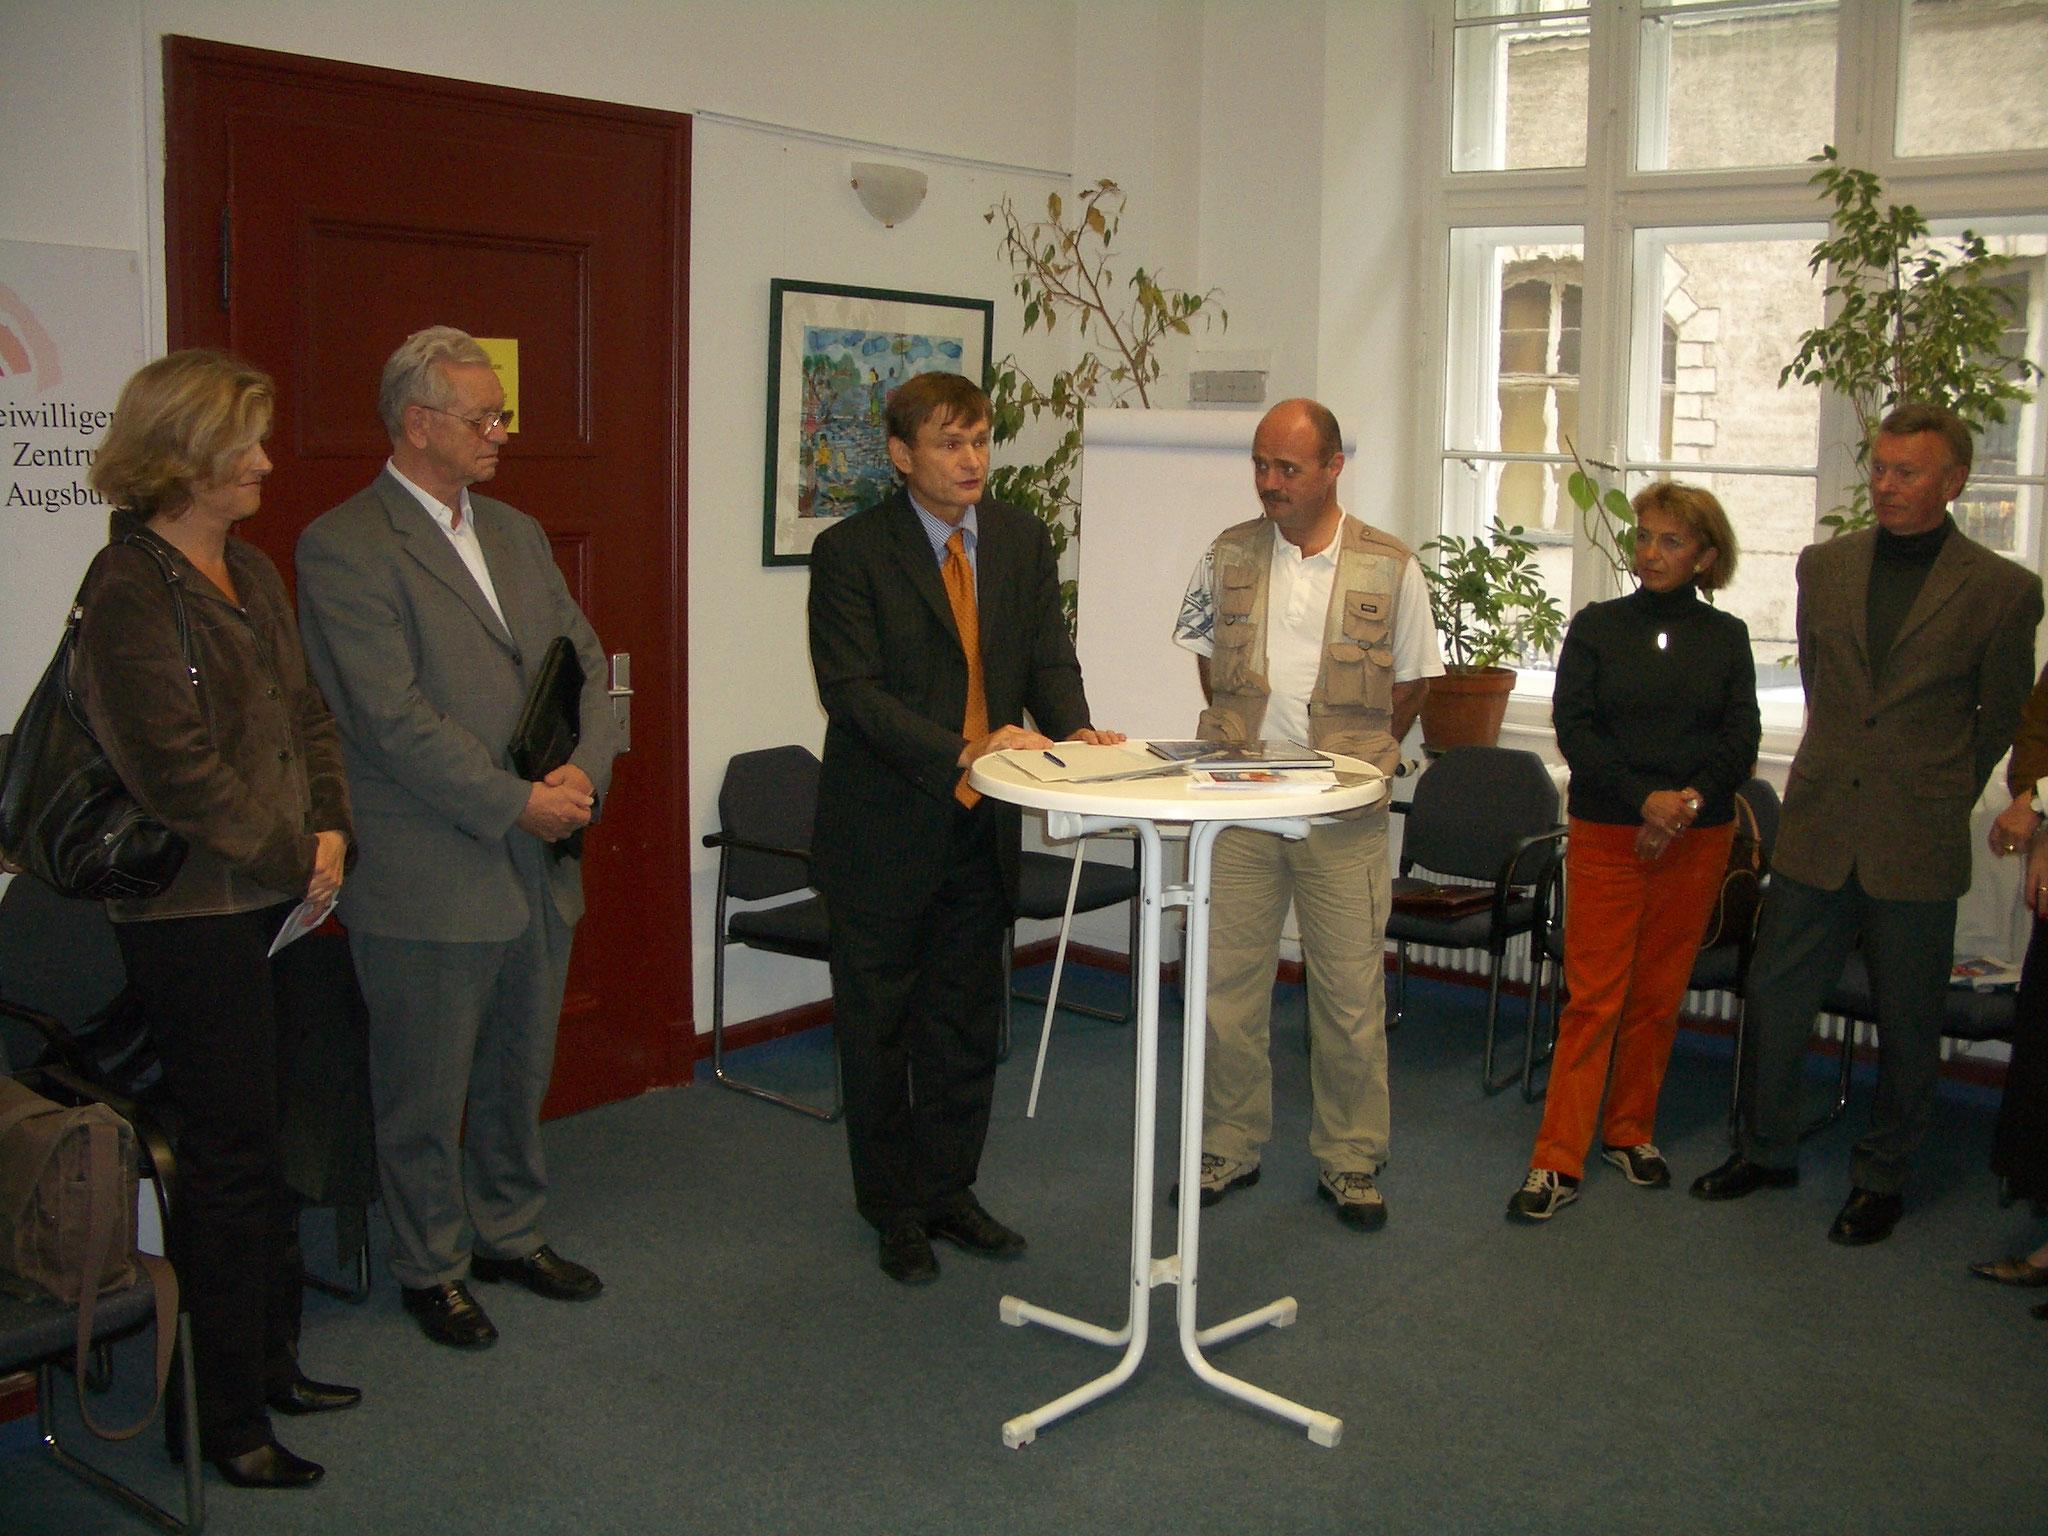 "Bürgertreff 29.09.05 ""Aktionsbündnis Augsburg-Asien"" - Foto: Wolfgang F. Lightmaster - Freiwilligen-Zentrum Augsburg"